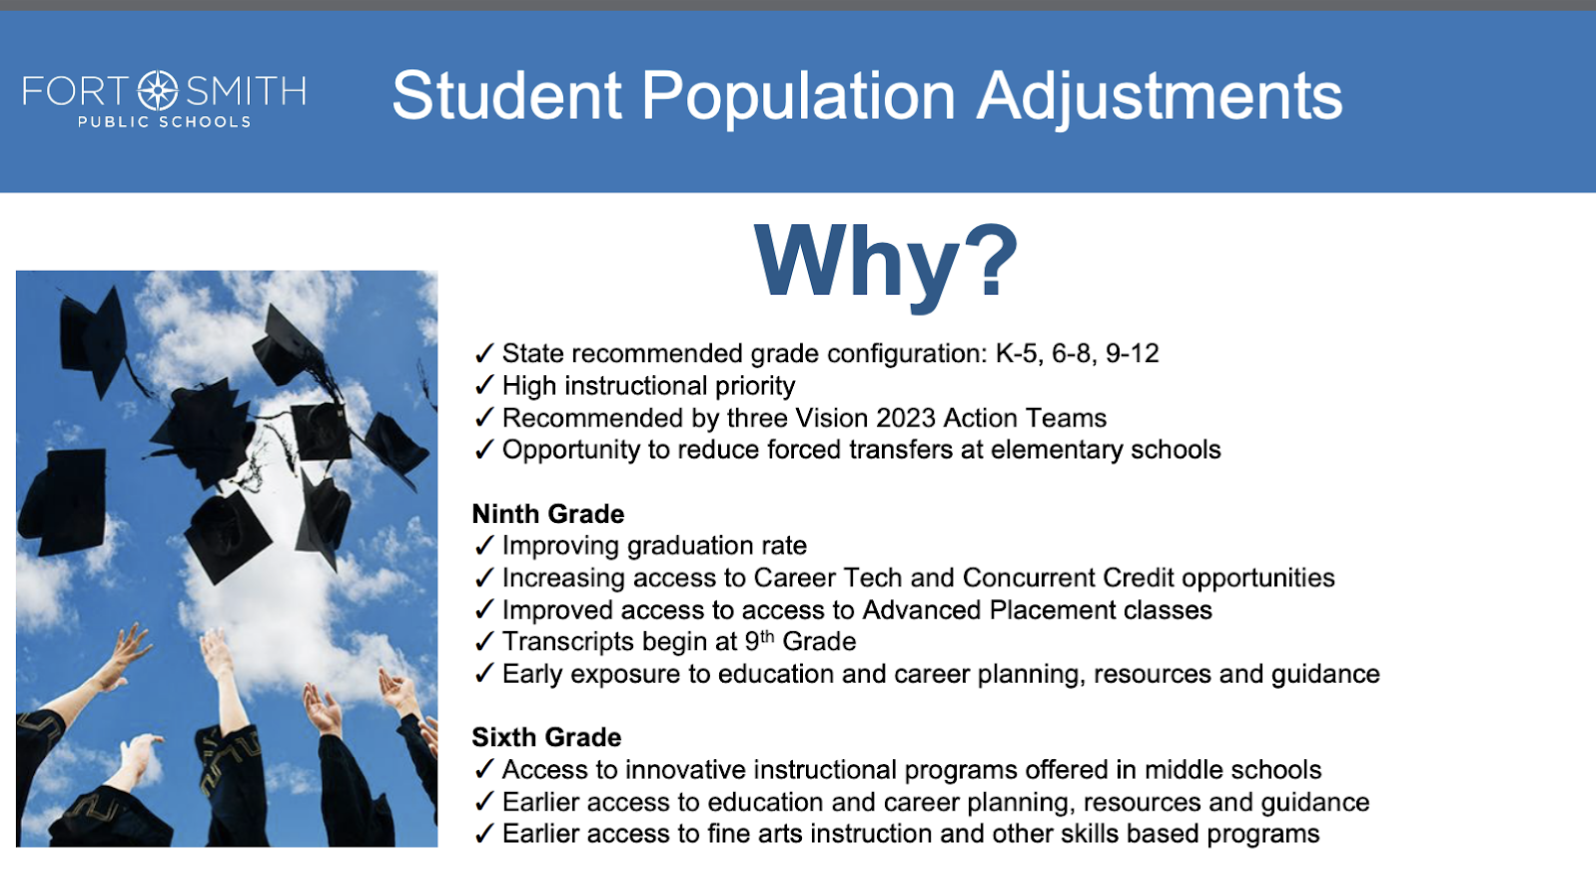 Student Population Adjustments